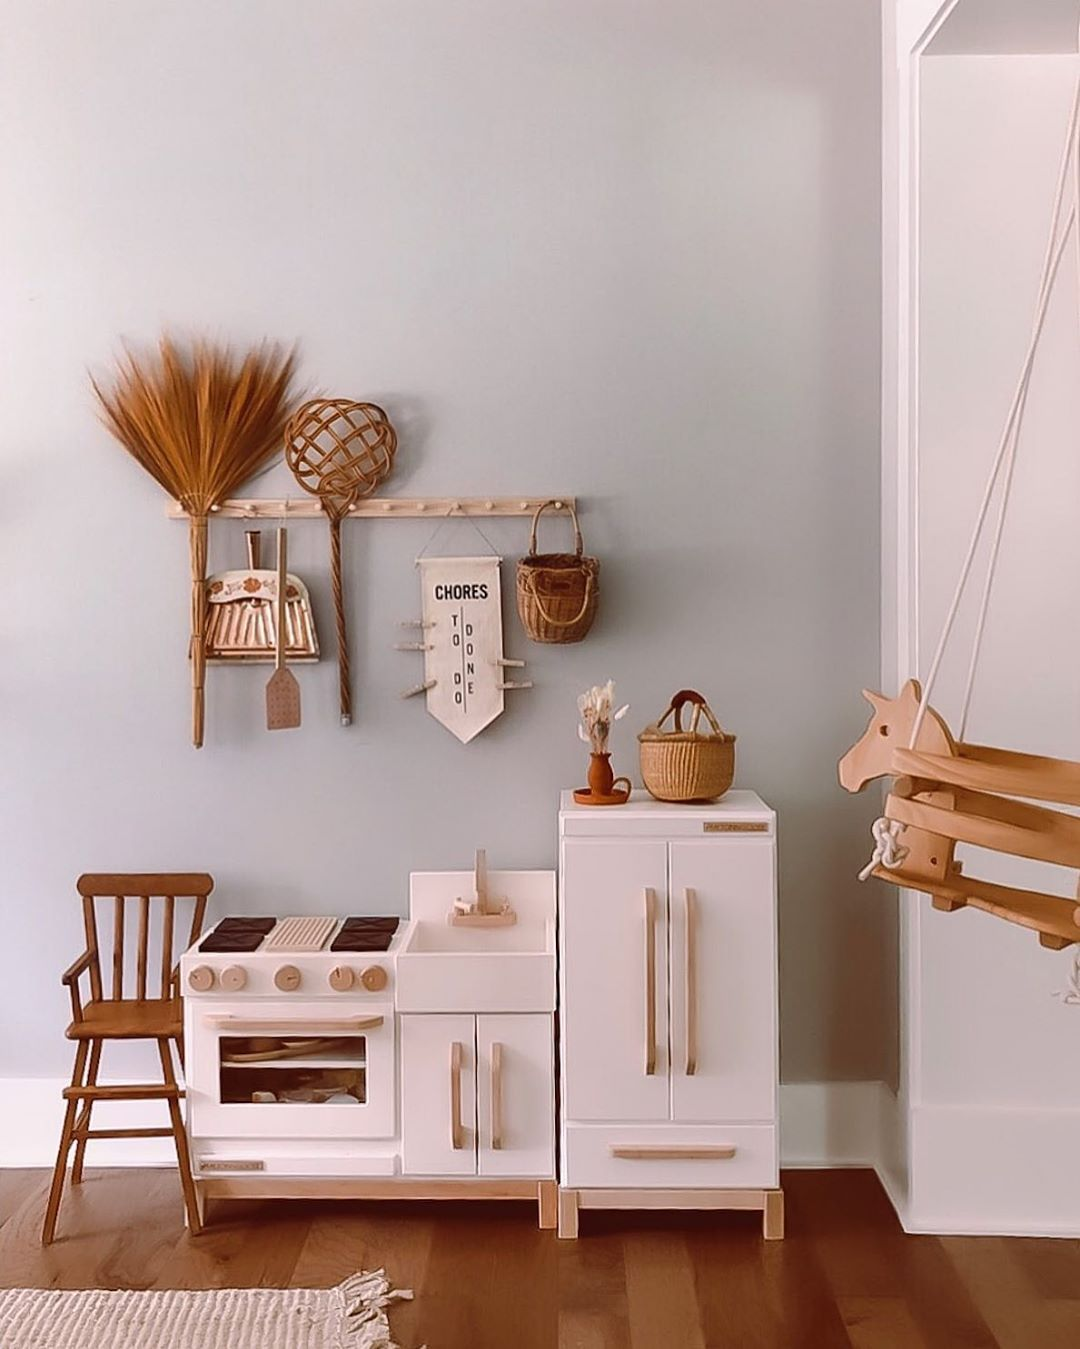 nursery, wooden floor, white wall, white cabinet, white sink, woodne hooks, wooden chair, wooden swing